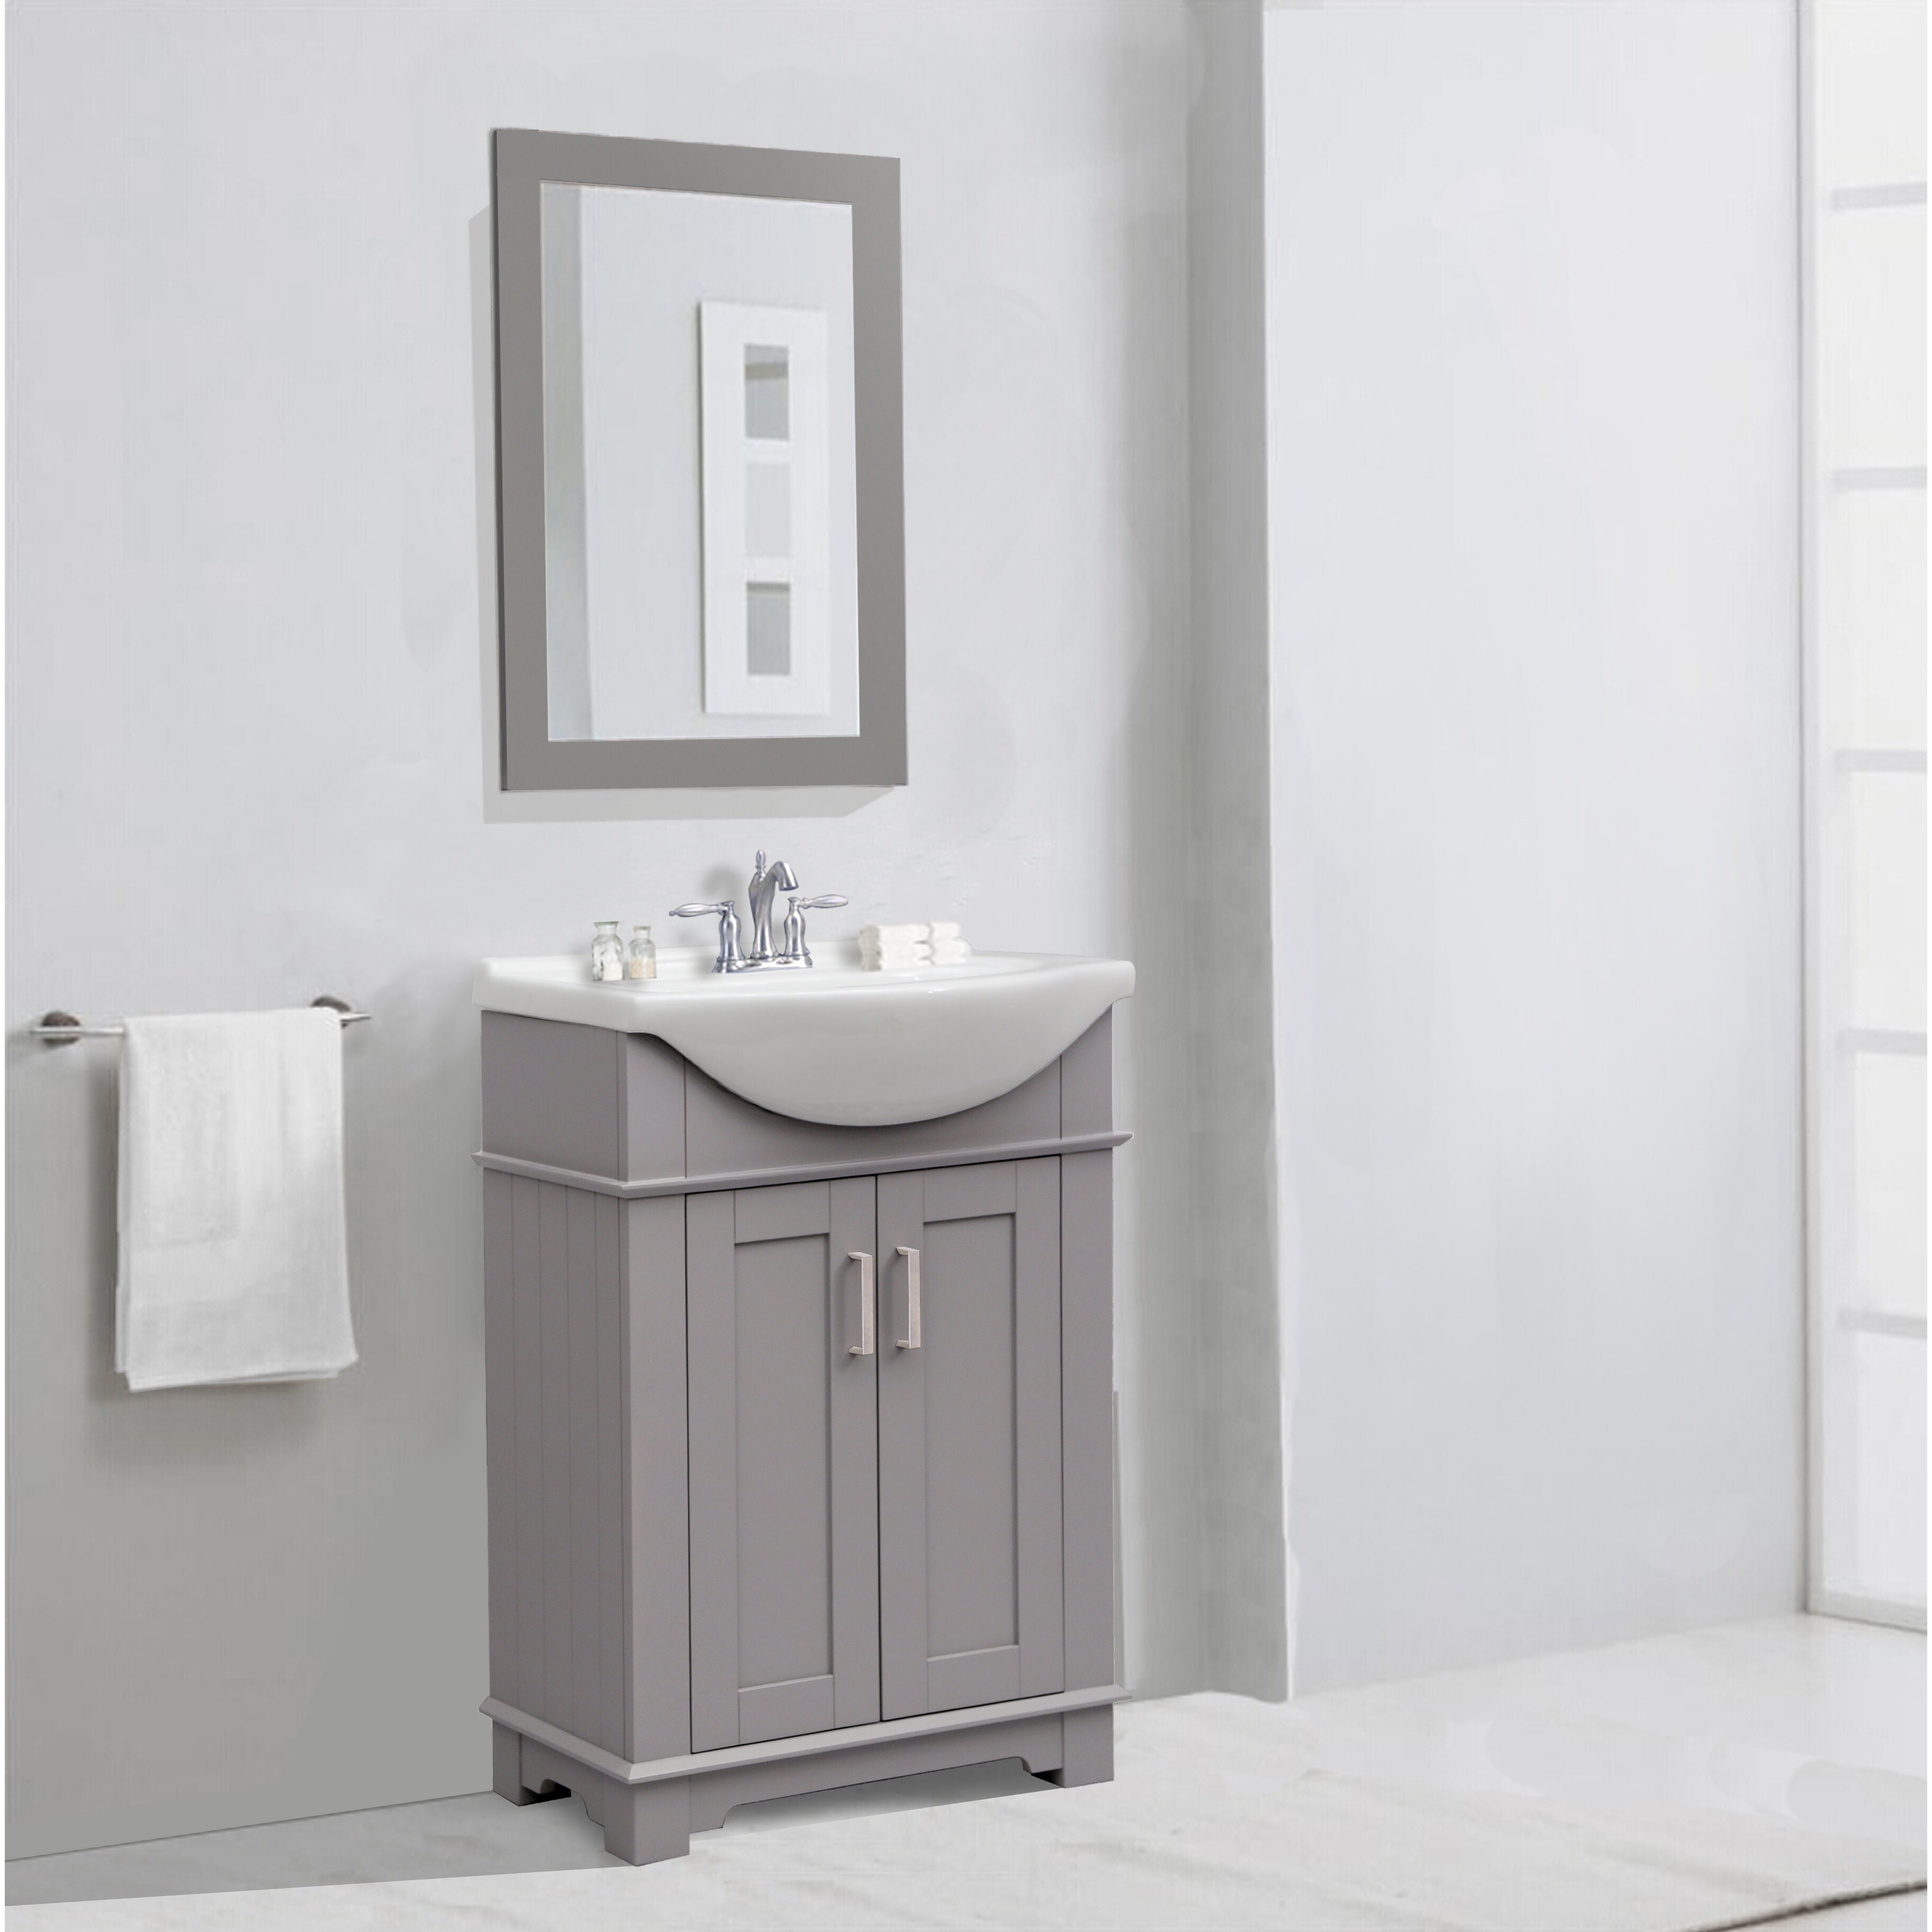 24 inch bathroom